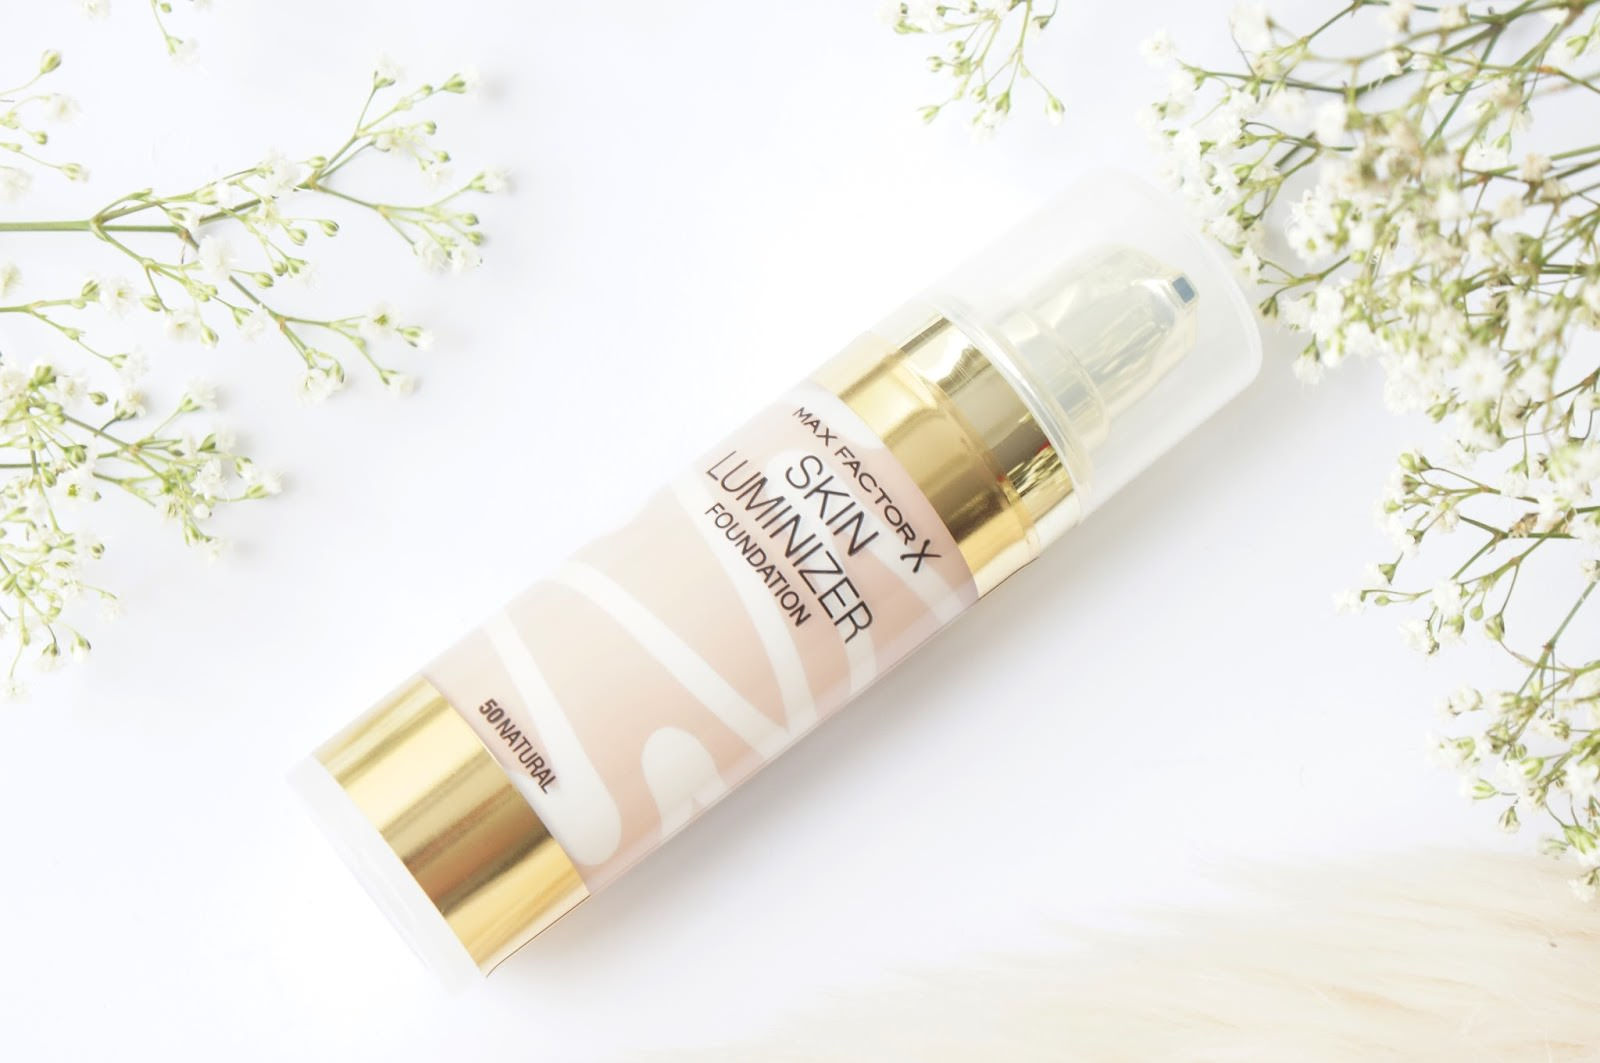 Maxfactor Skin Luminizier 50 Natural